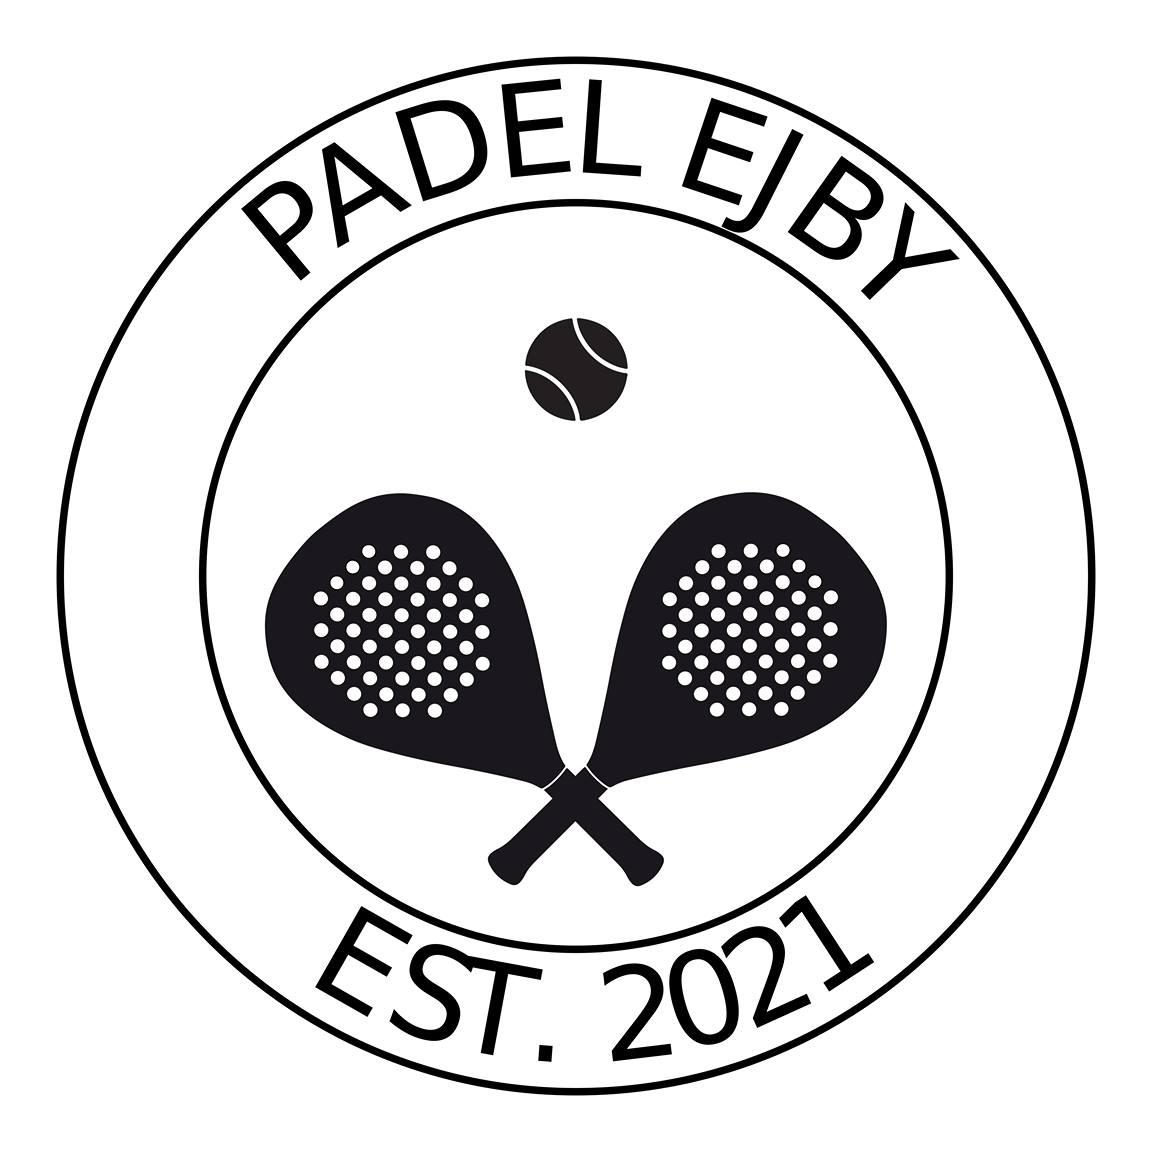 Ejby Padel har fået en Facebook-side